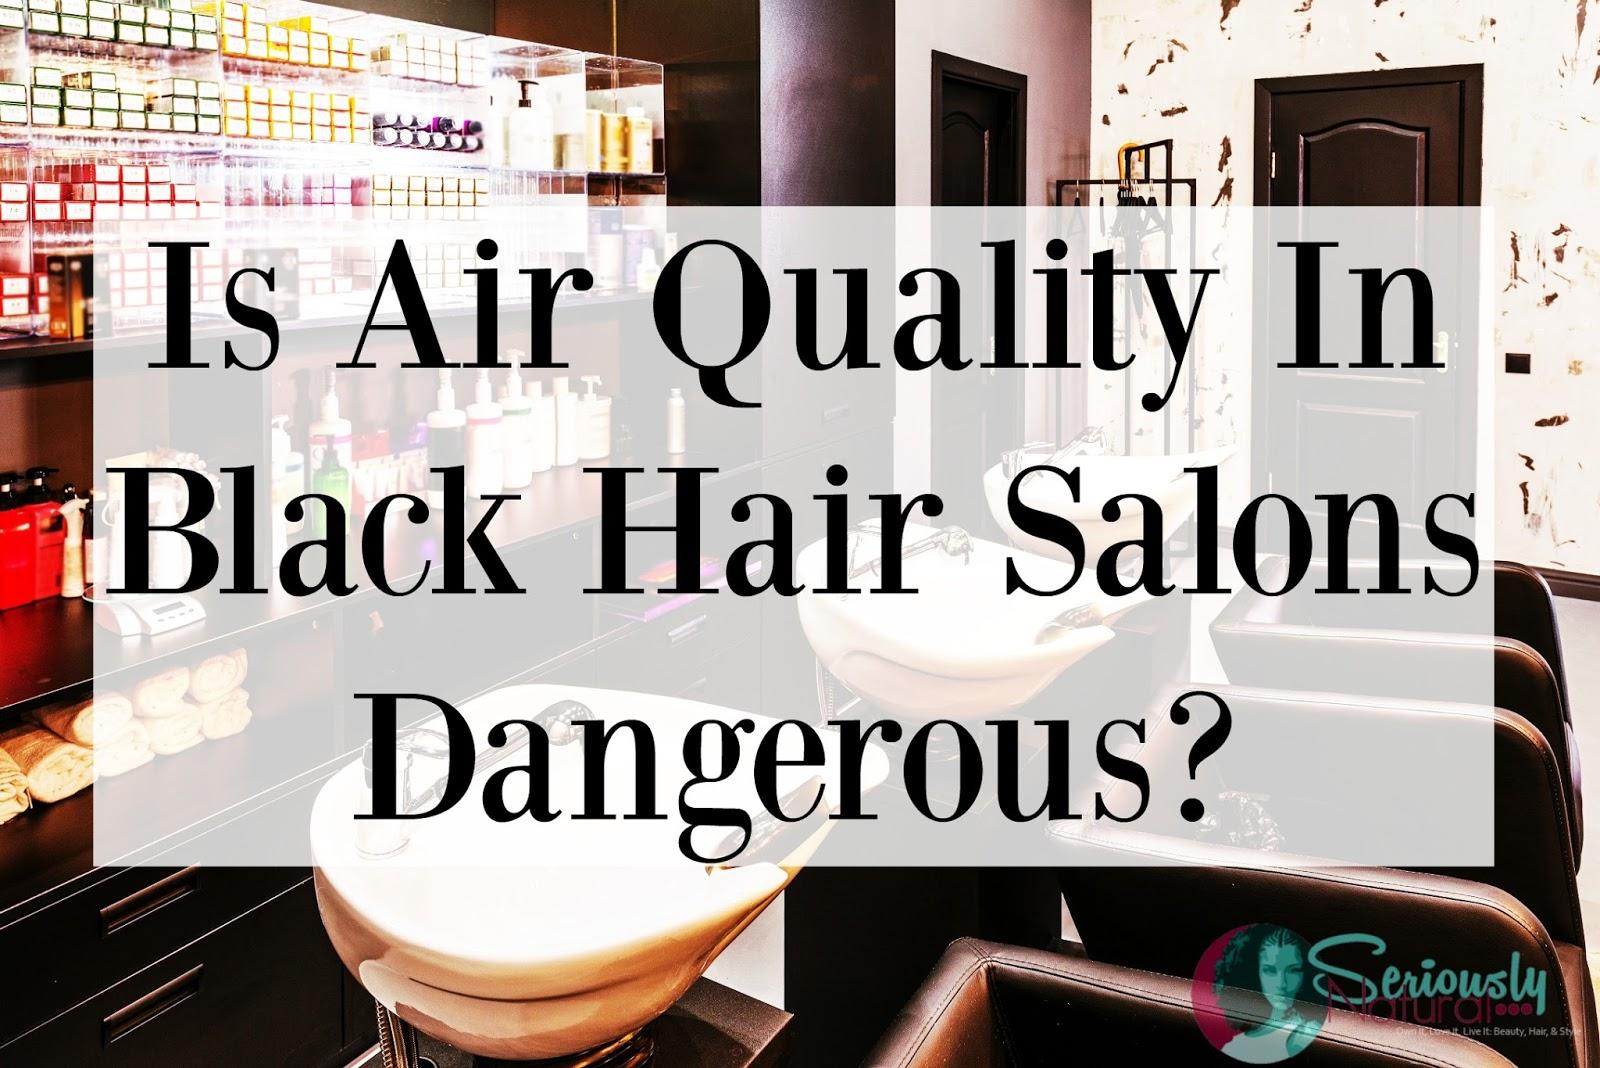 Is Air Quality In Black Hair Salons Dangerous?